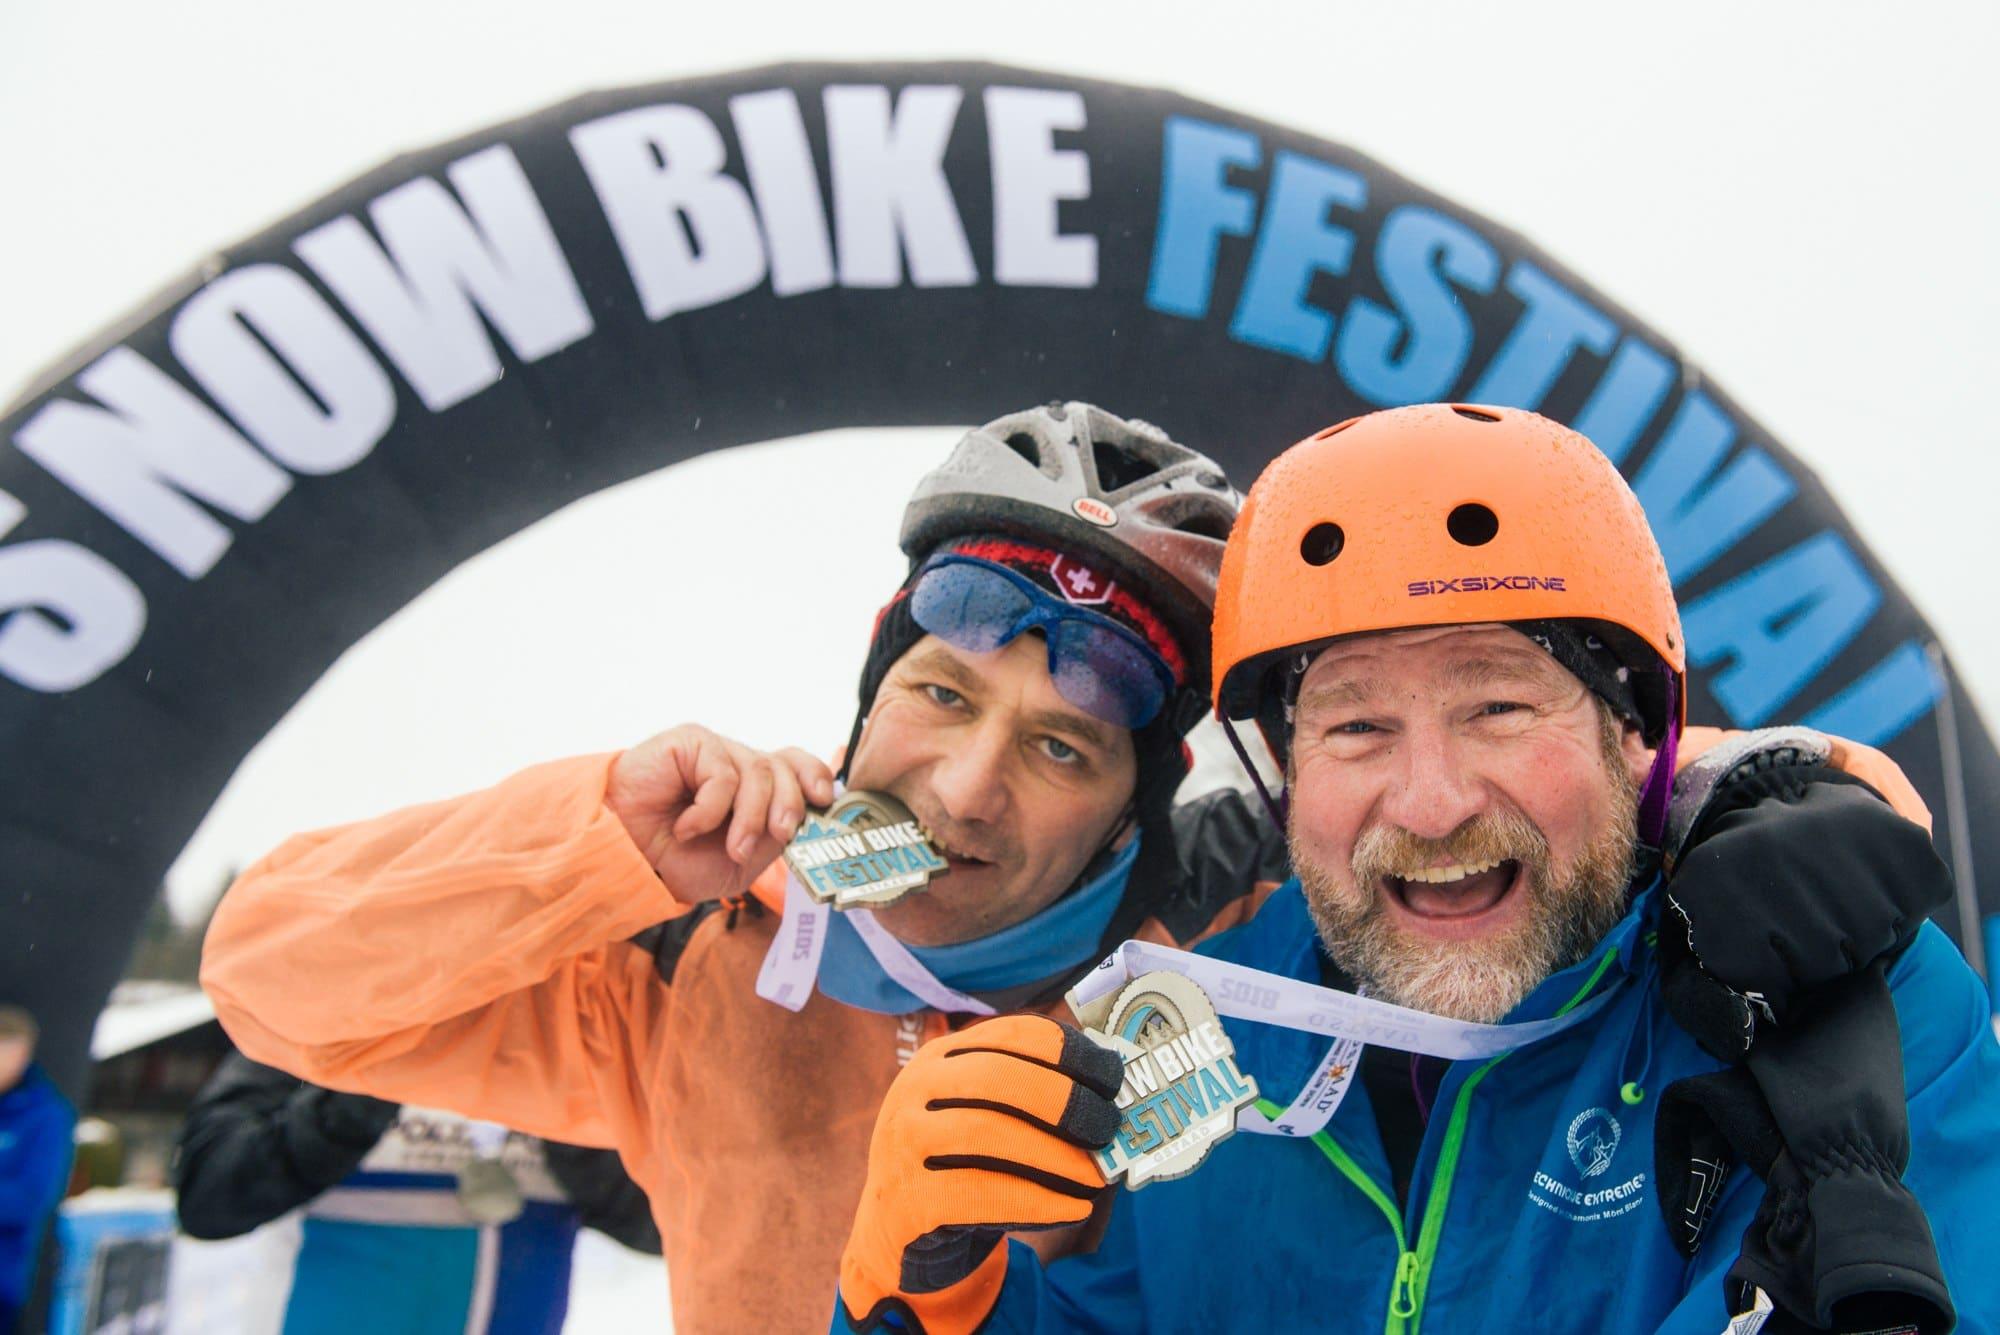 Snow Bike Festival the finish